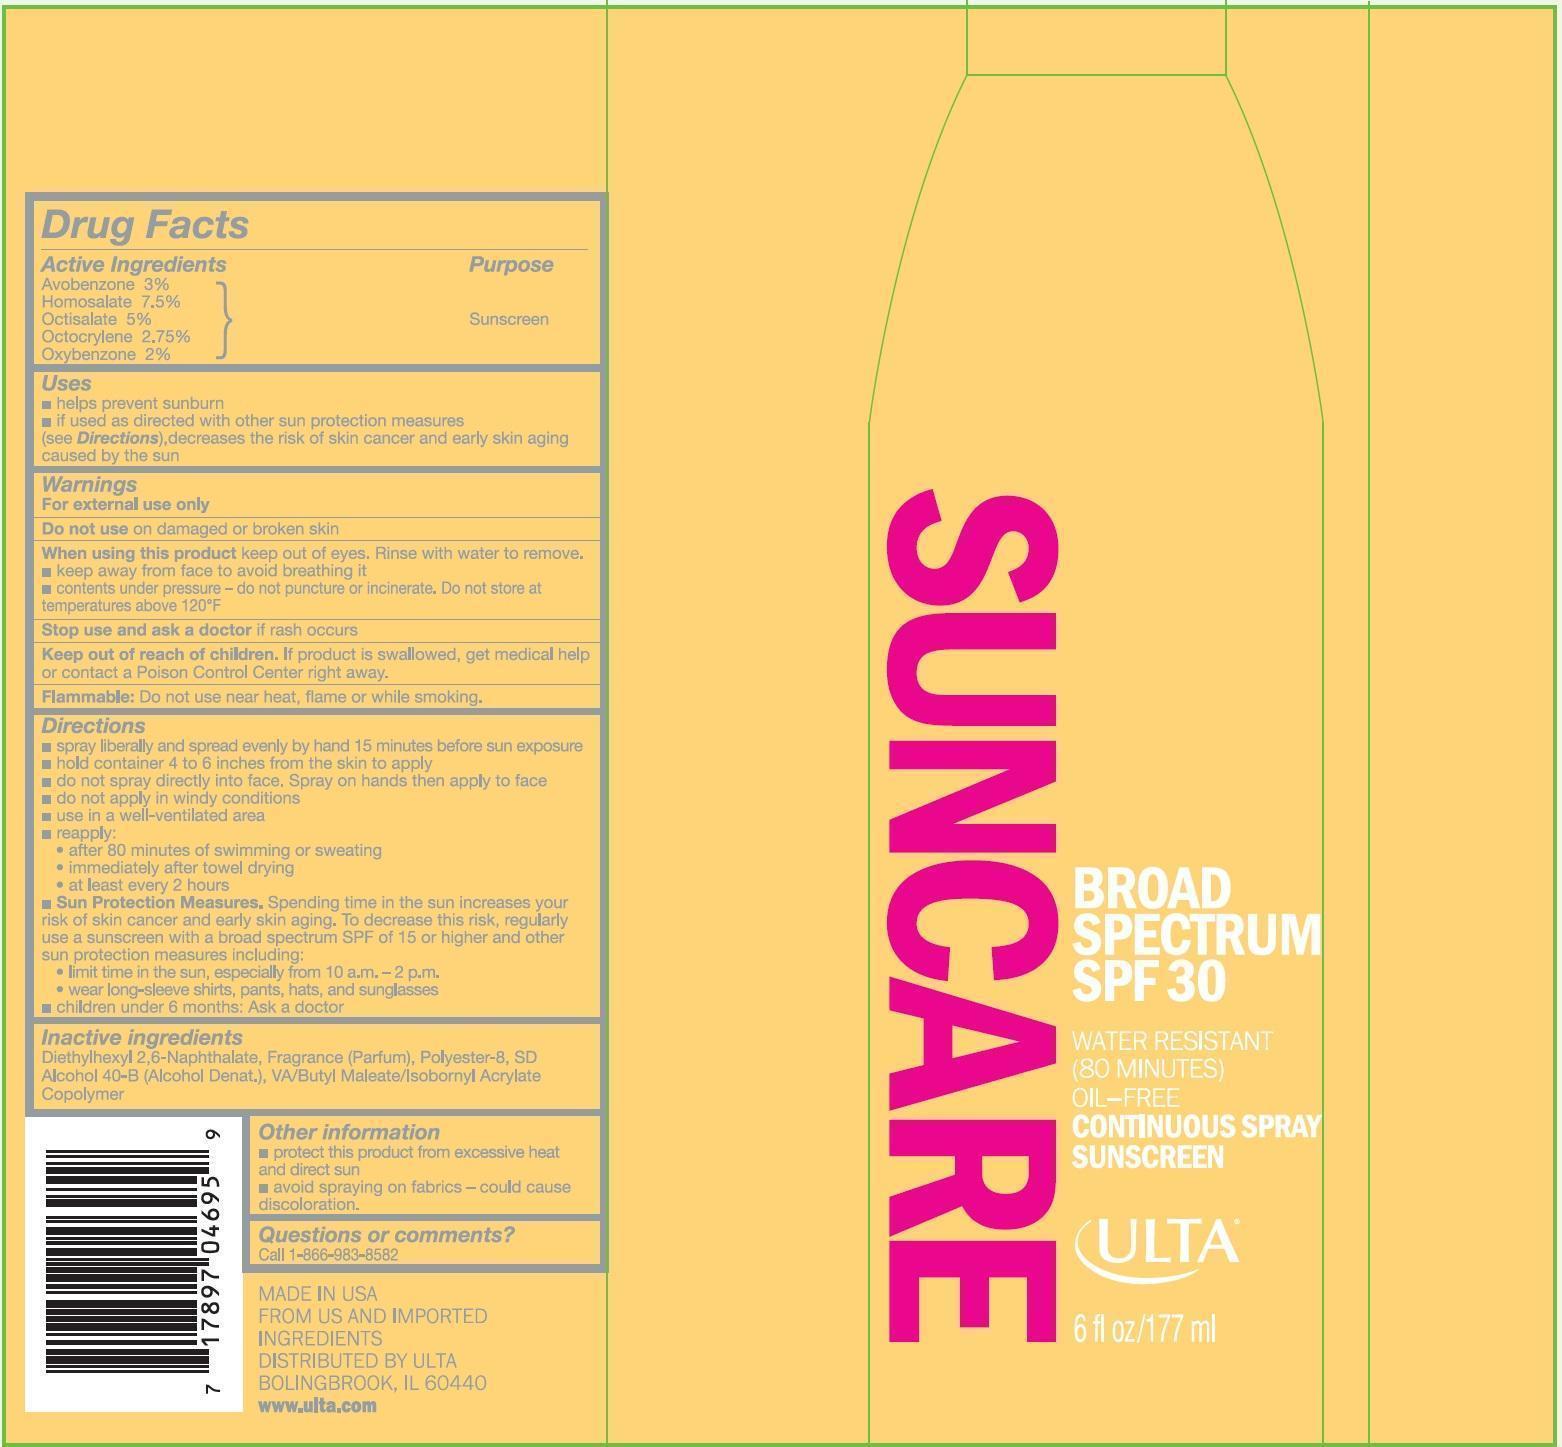 Ulta Broad Spectrum Spf 30 (Avobenzone, Homosalate, Octisalate, Octocrylene And Oxybenzone) Spray [Prime Packaging, Inc.]